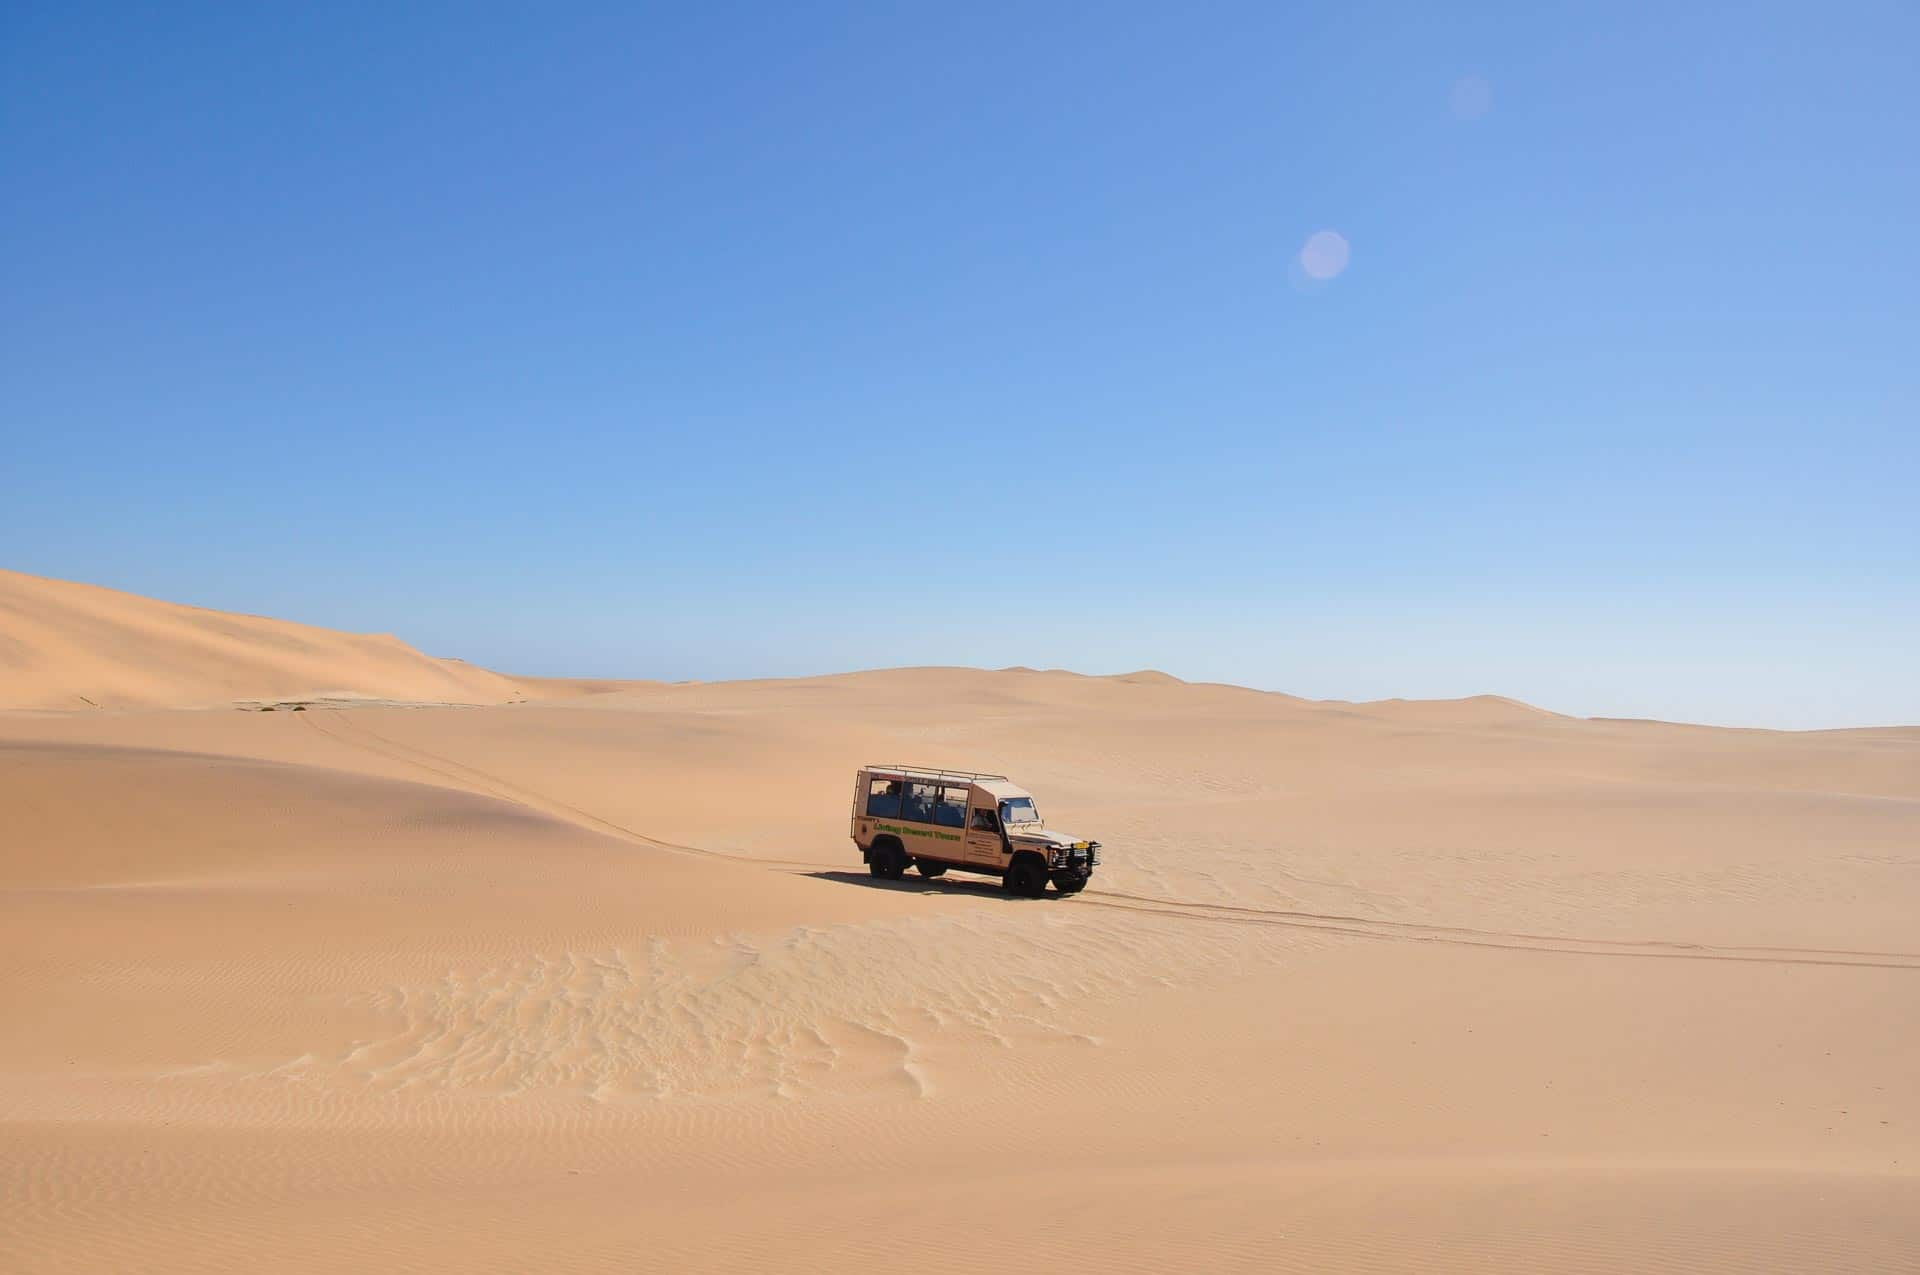 Living-Desert-Tour-Swakopmund-Namibia-Globetrotter-Select-20